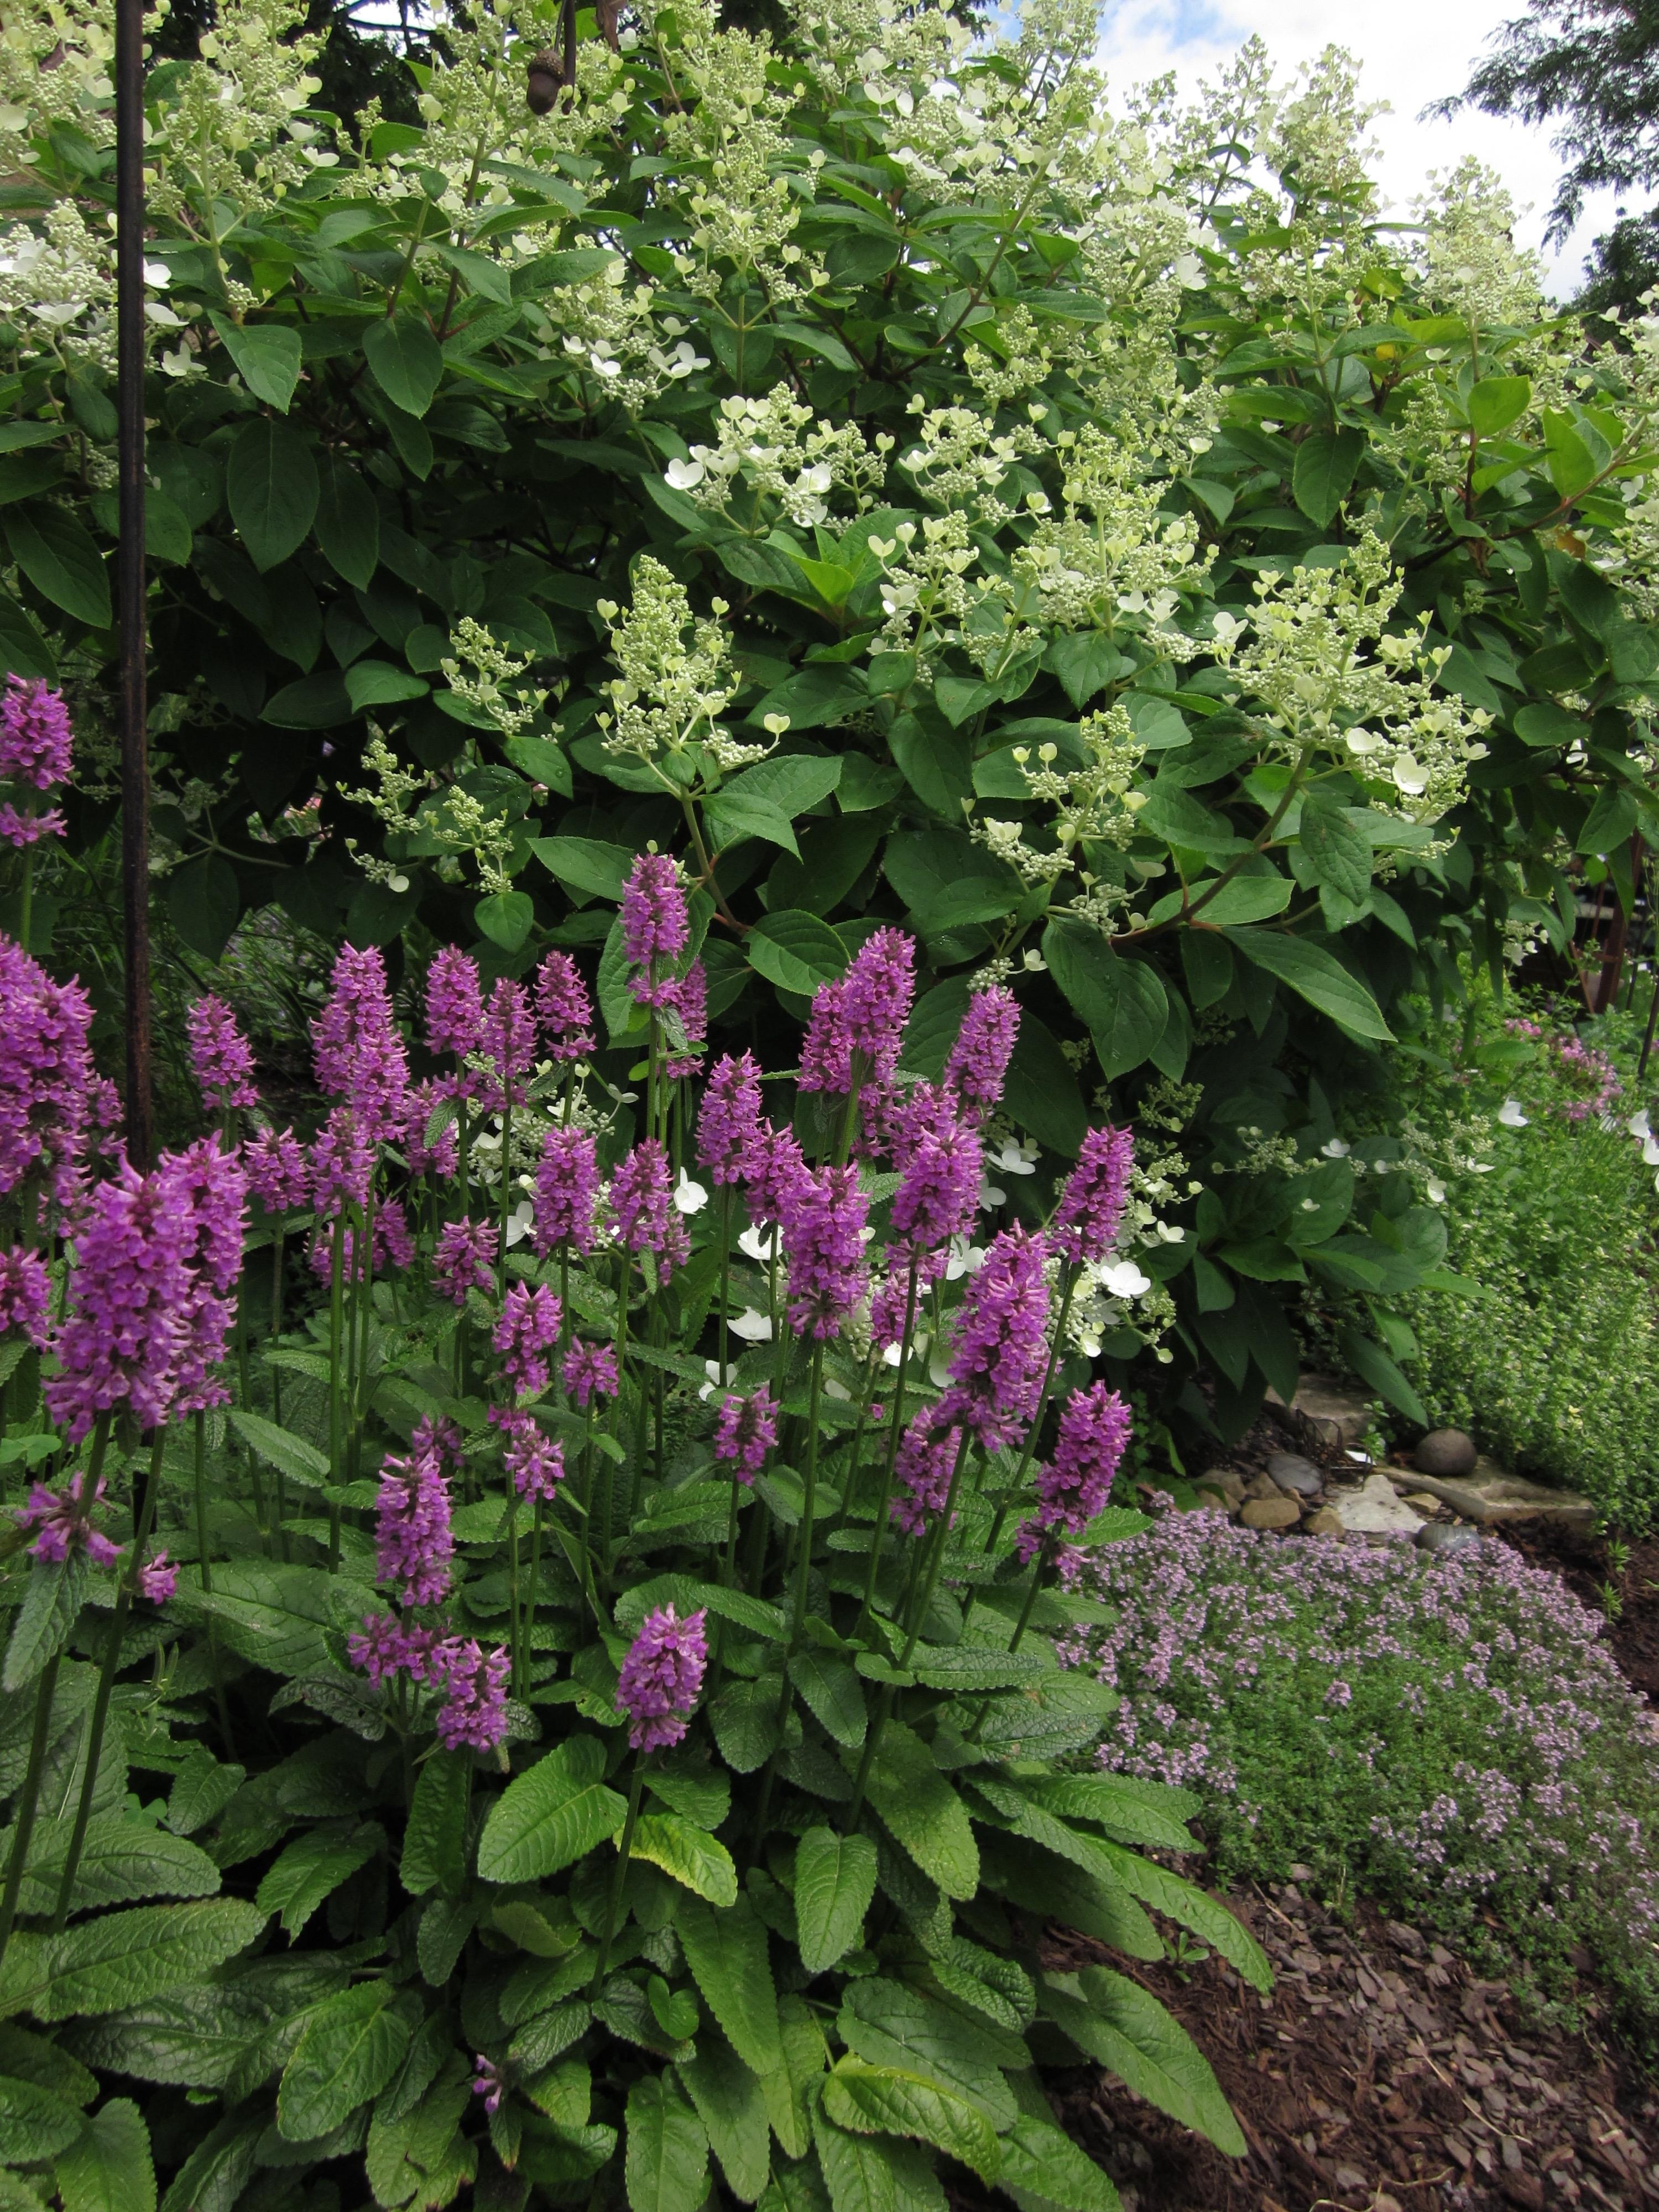 The growing place garden center naperville illinois il for Xd garden design